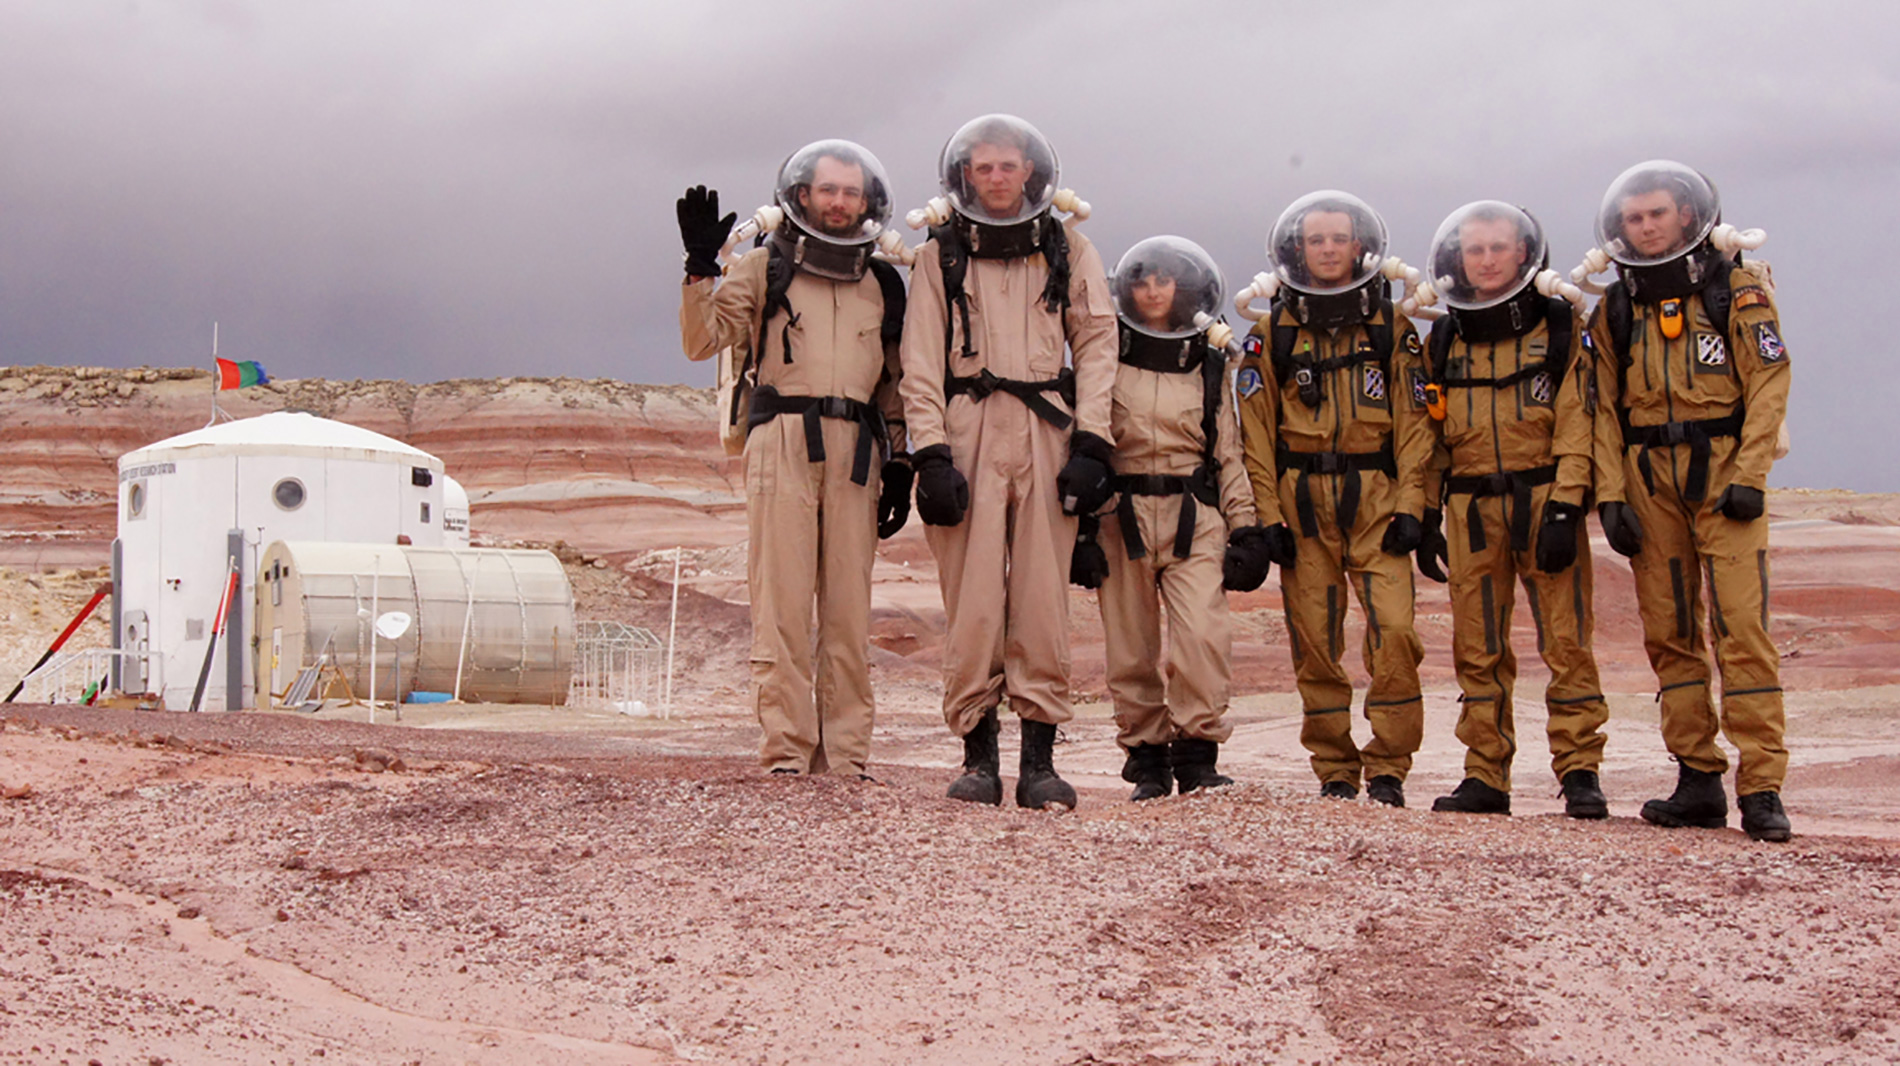 15 days on Mars - crew